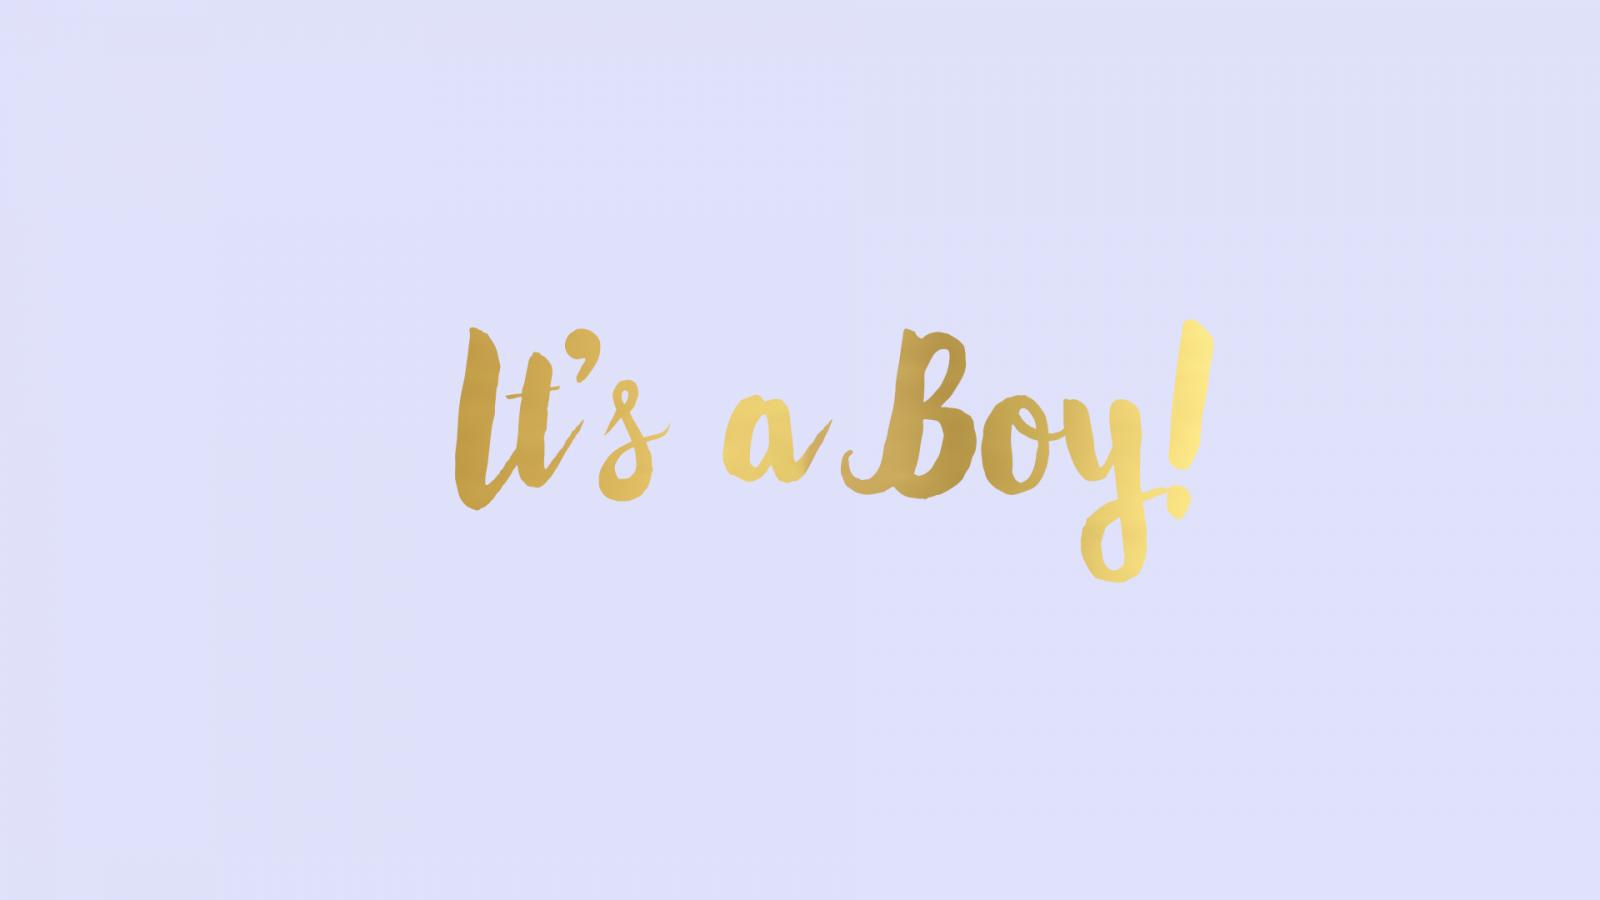 Free Download Its A Girl Boy Wallpaper Download 1920x1080